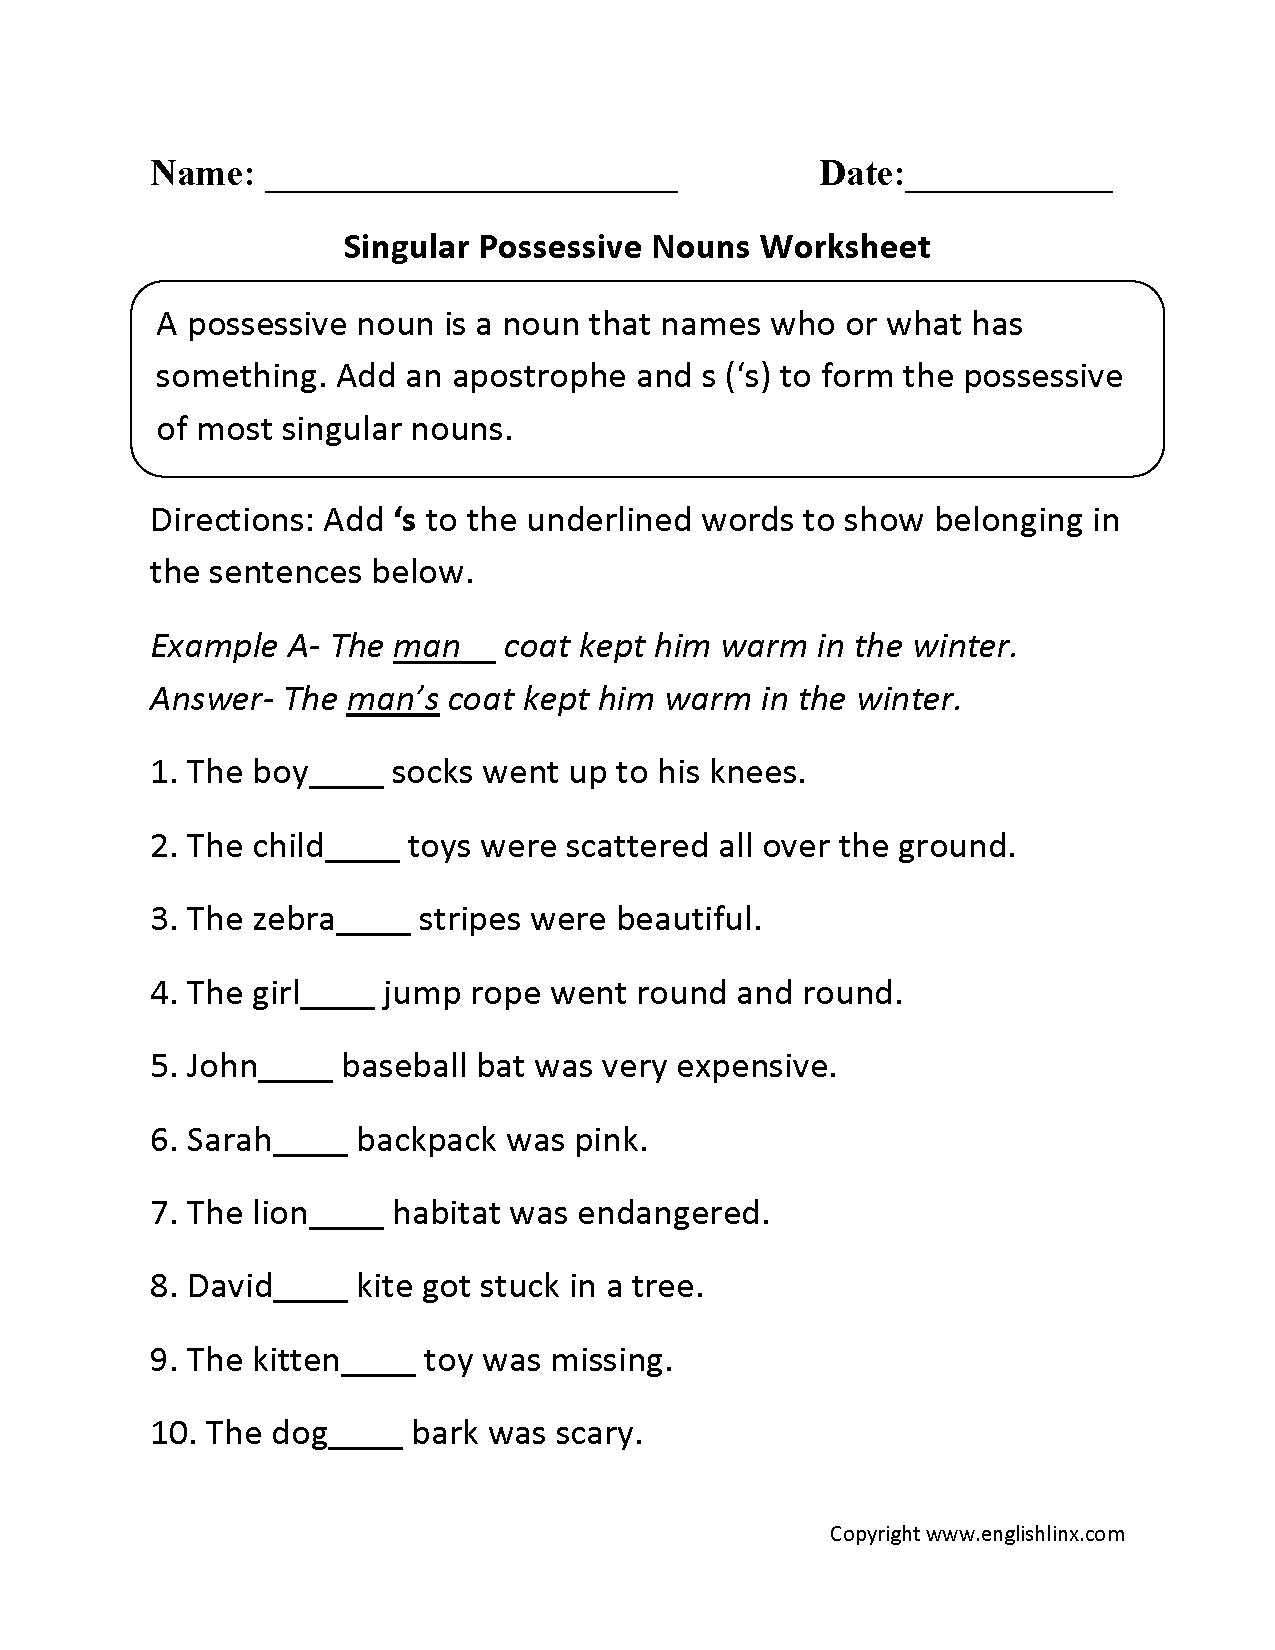 Possessive Noun Worksheets 3rd Grade The Best Worksheets Image